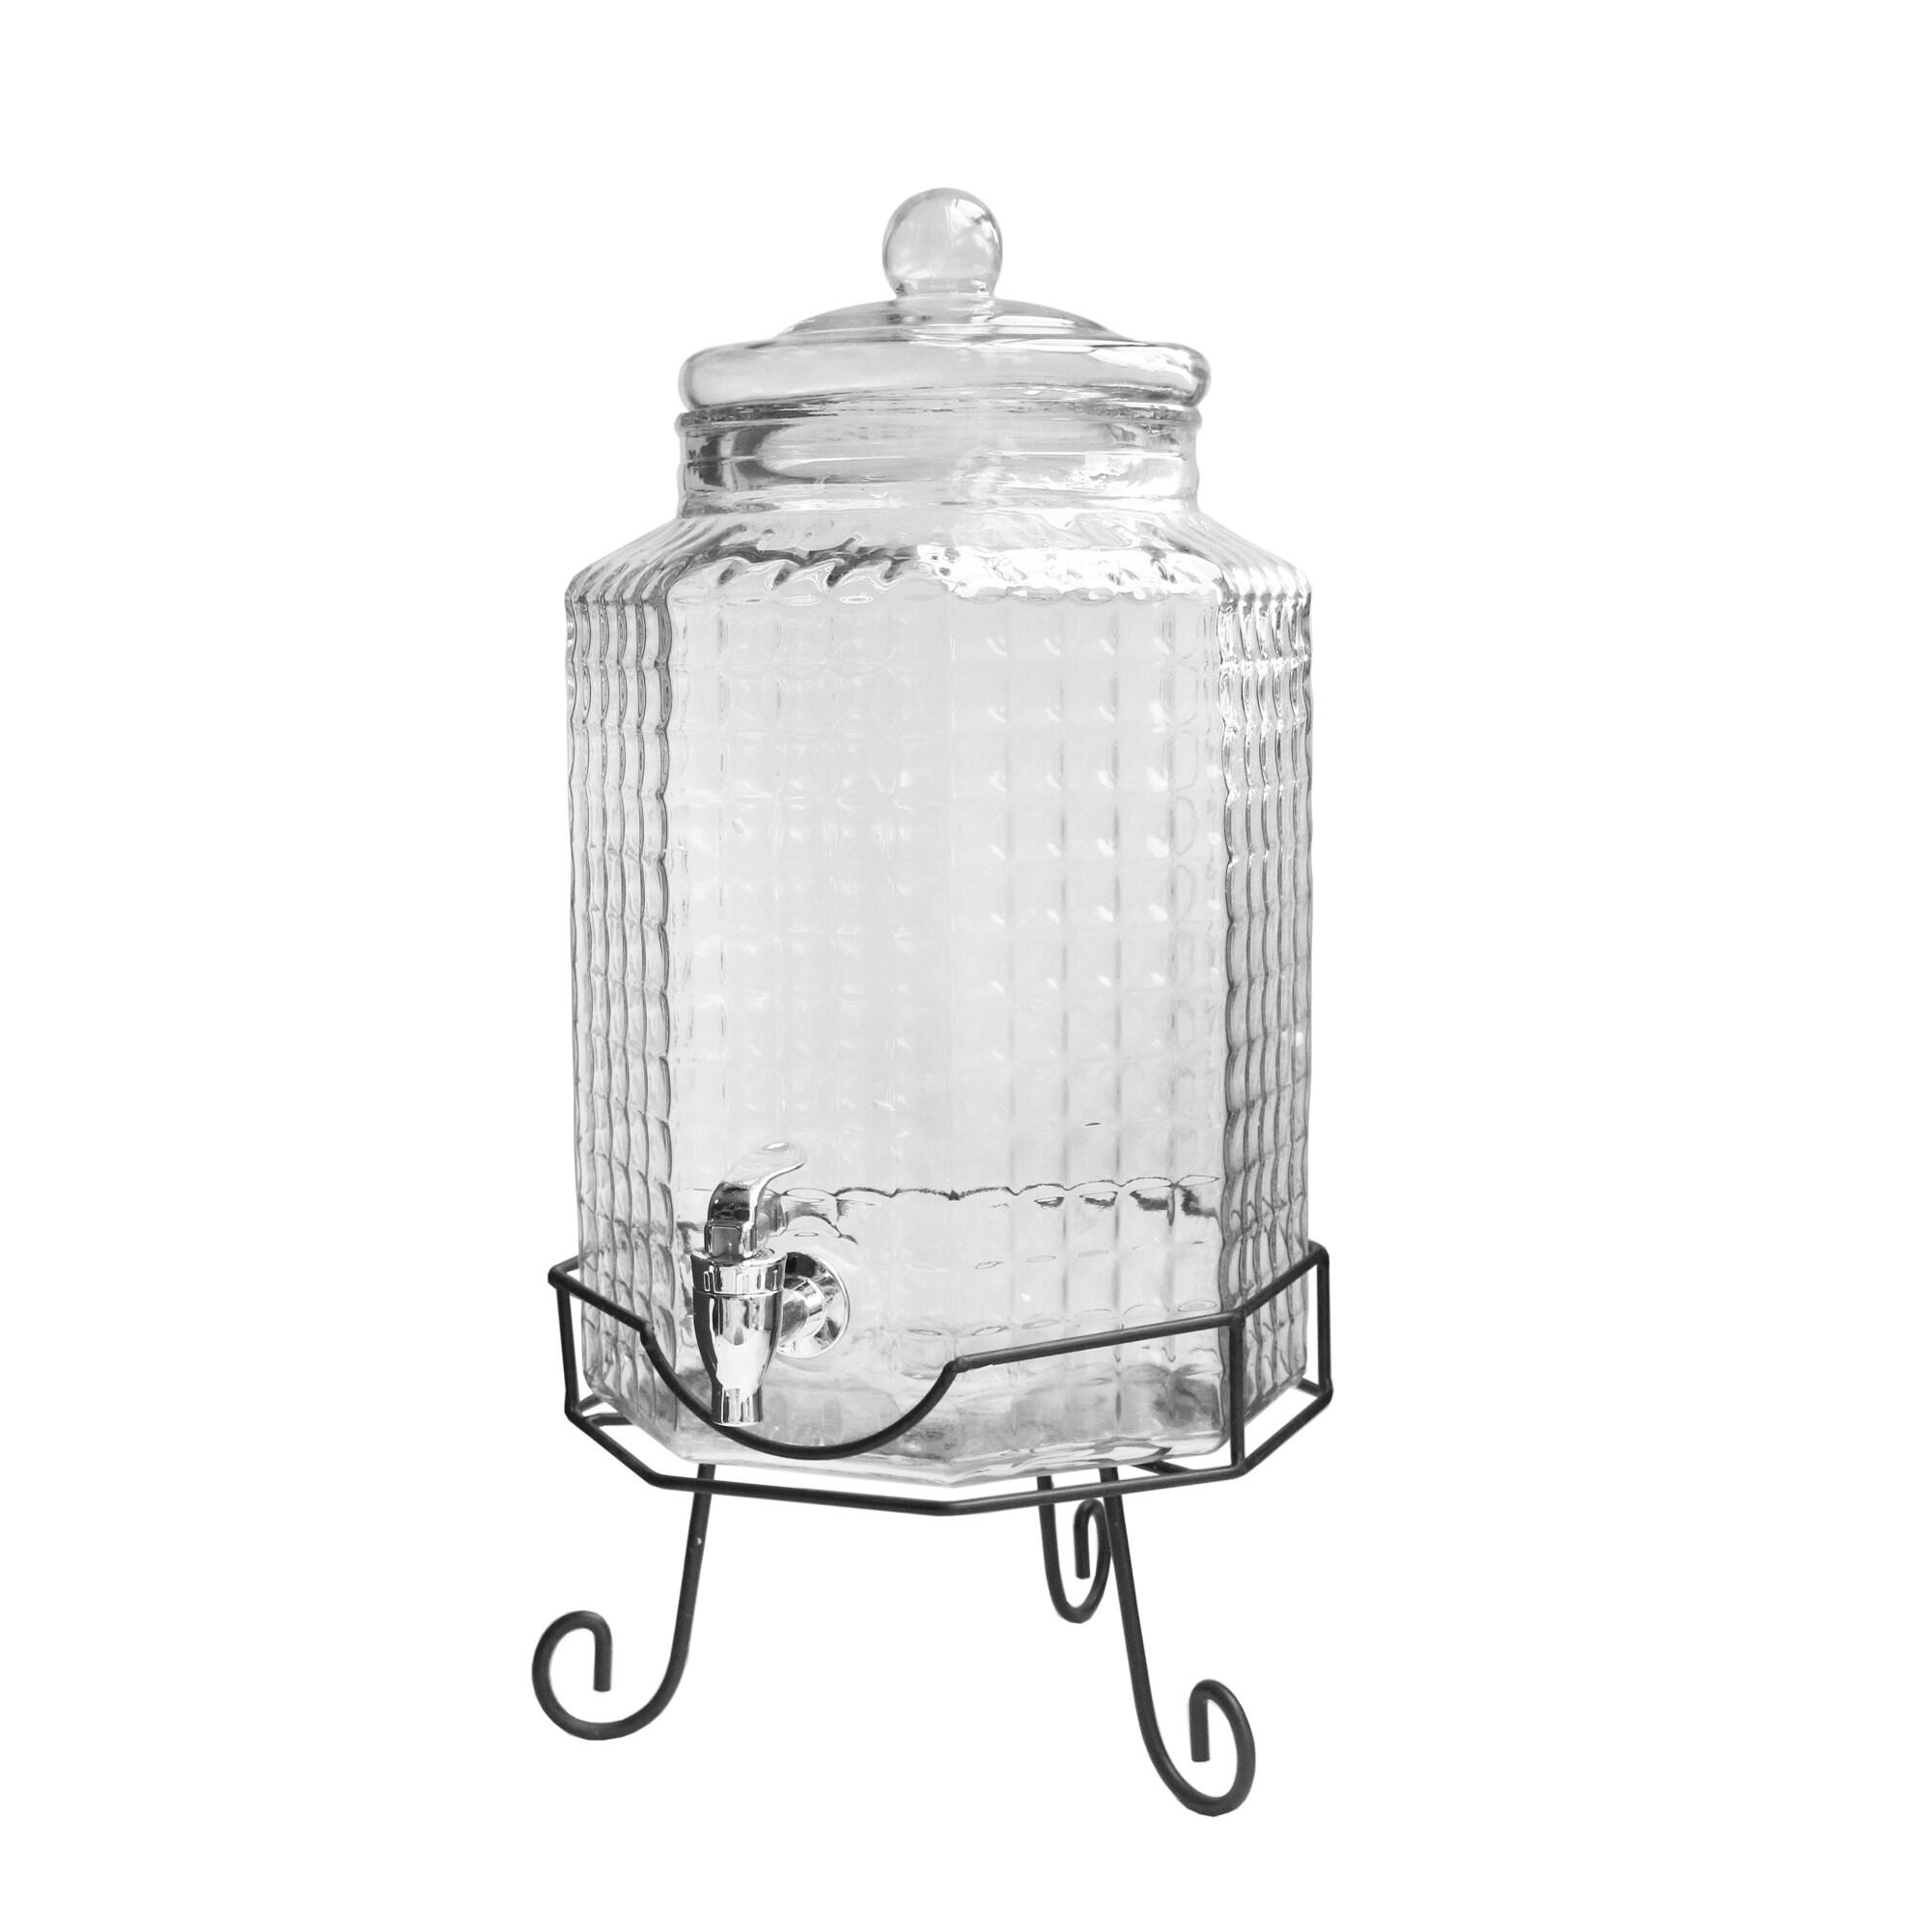 Gibson Bee Hive Beverage Dispenser White 1 gallon